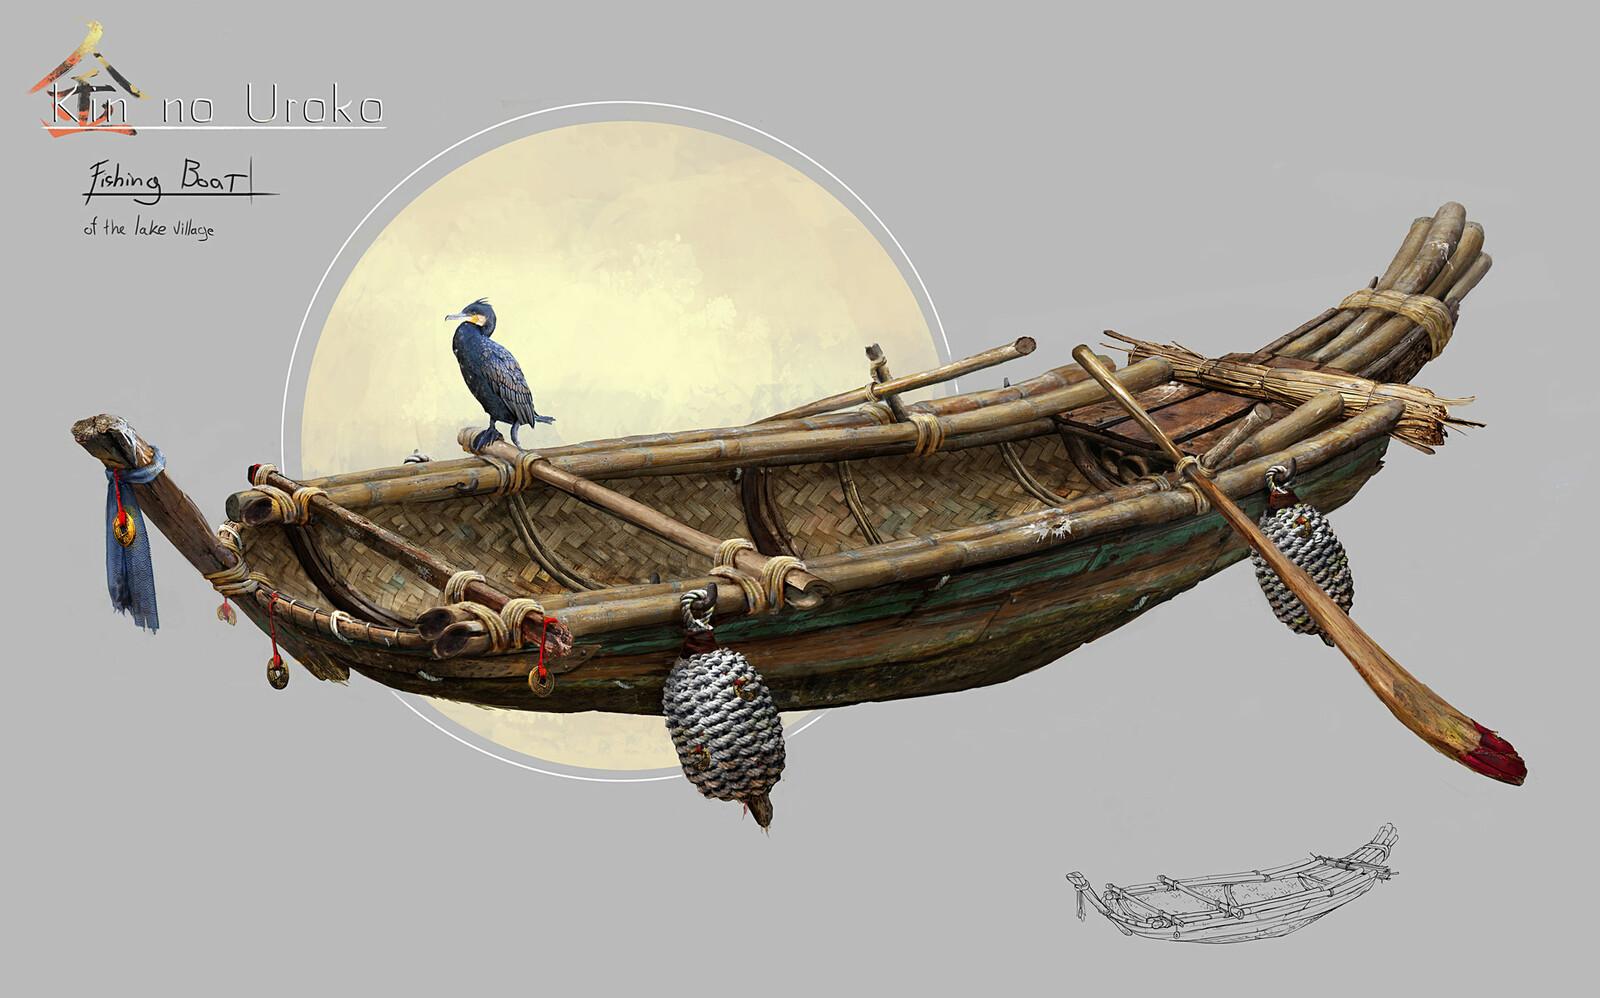 Concept art by Glenn van